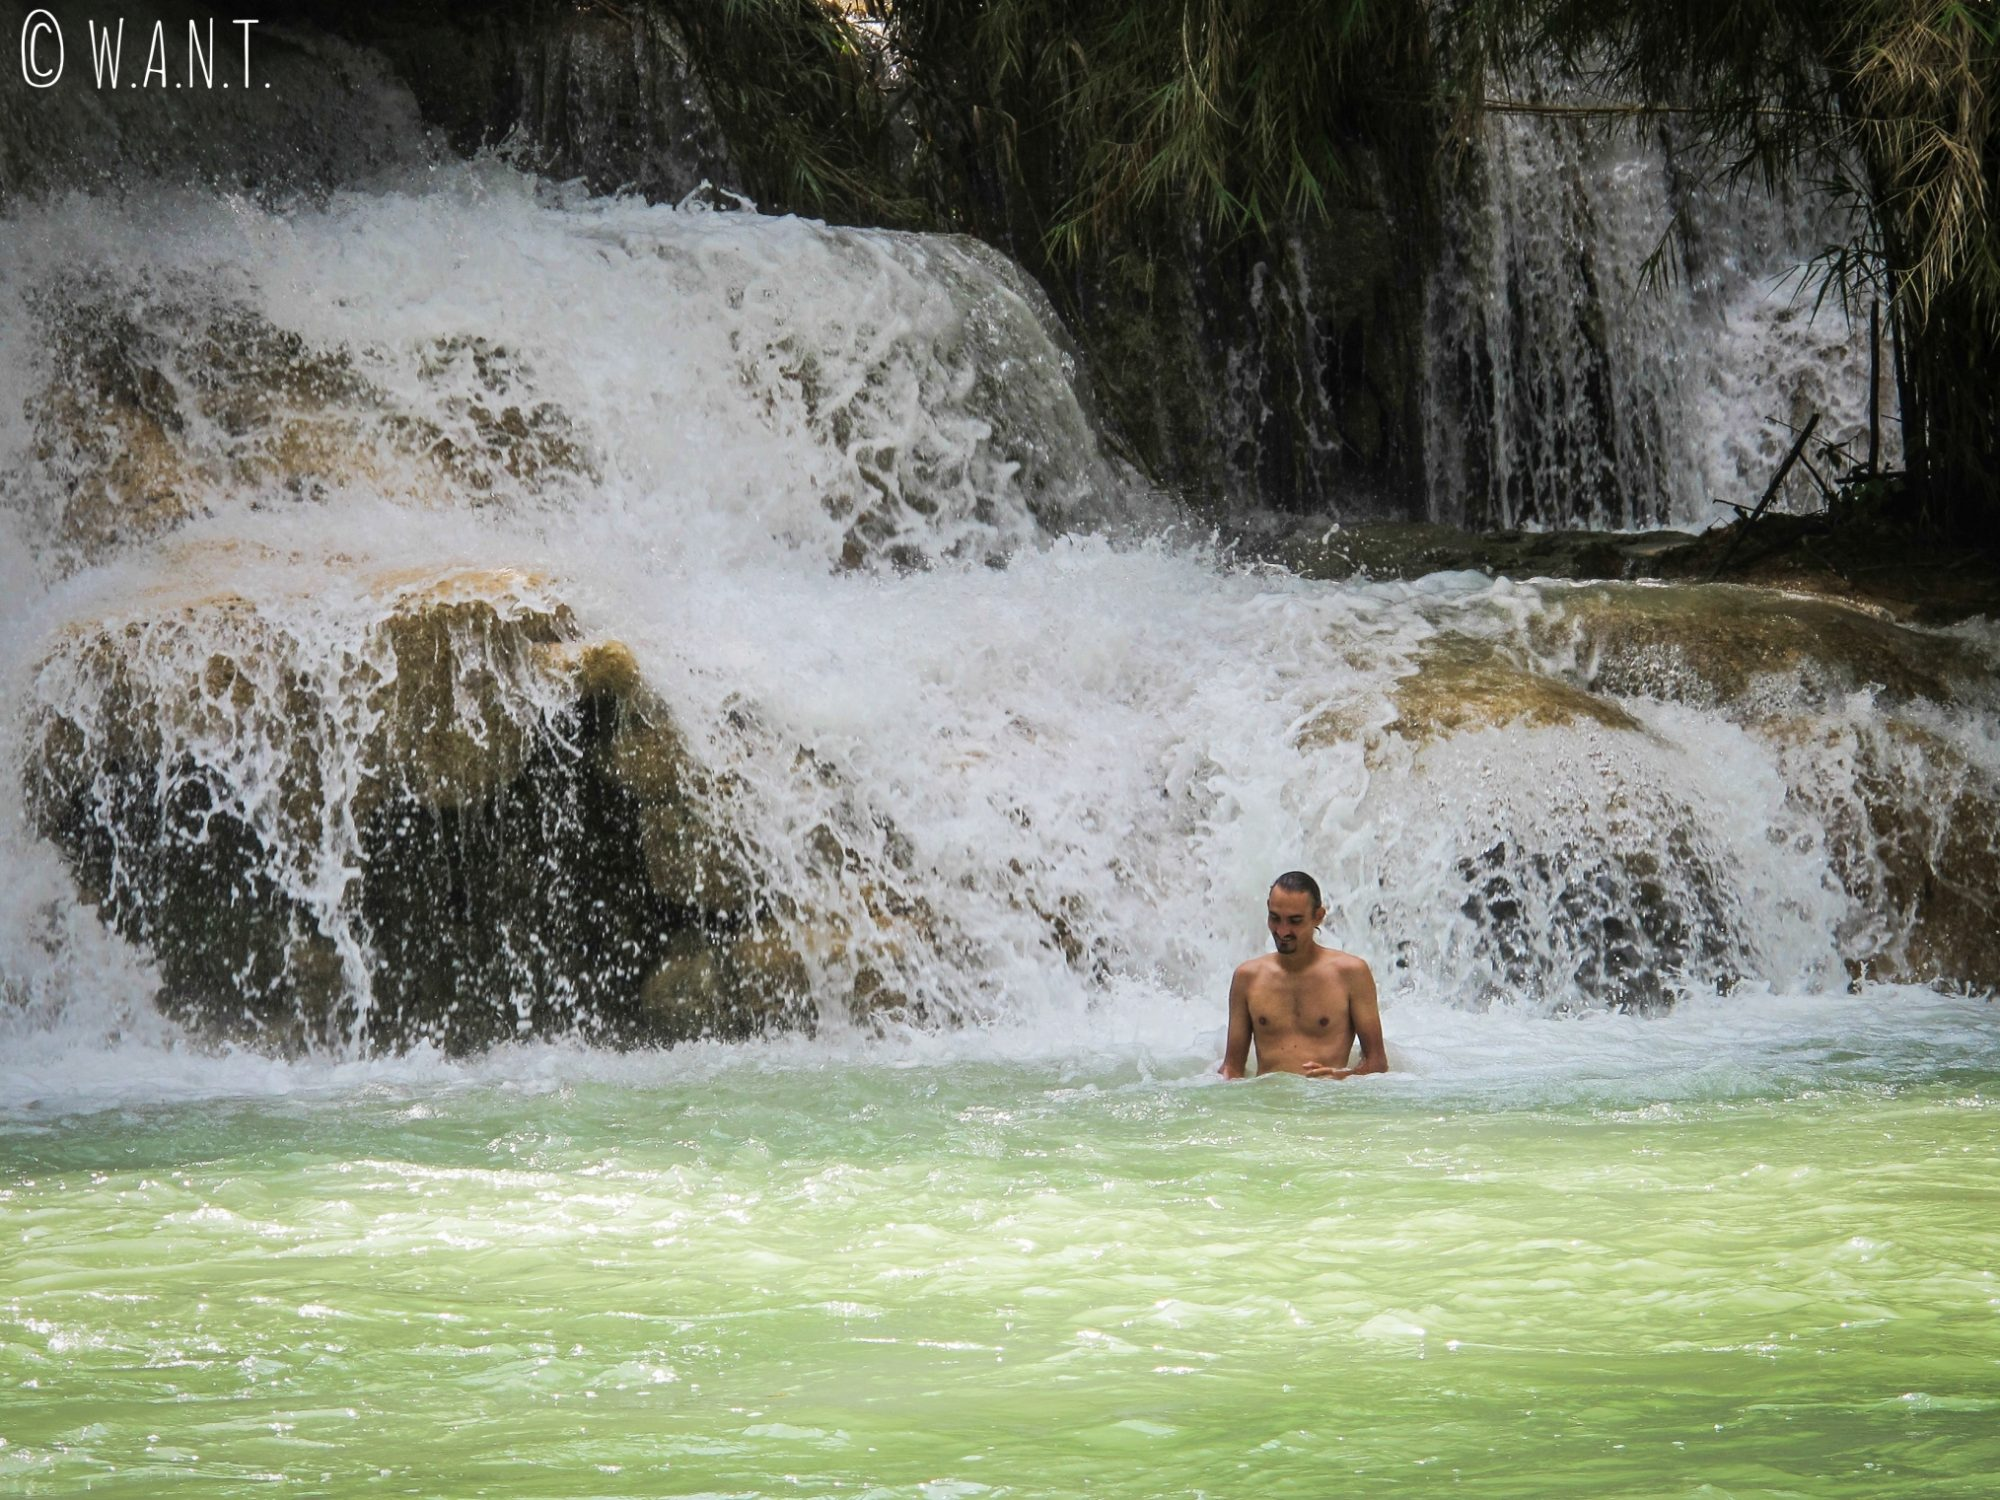 Benjamin s'est baigné dans la cascade Kuang Si à Luang Prabang